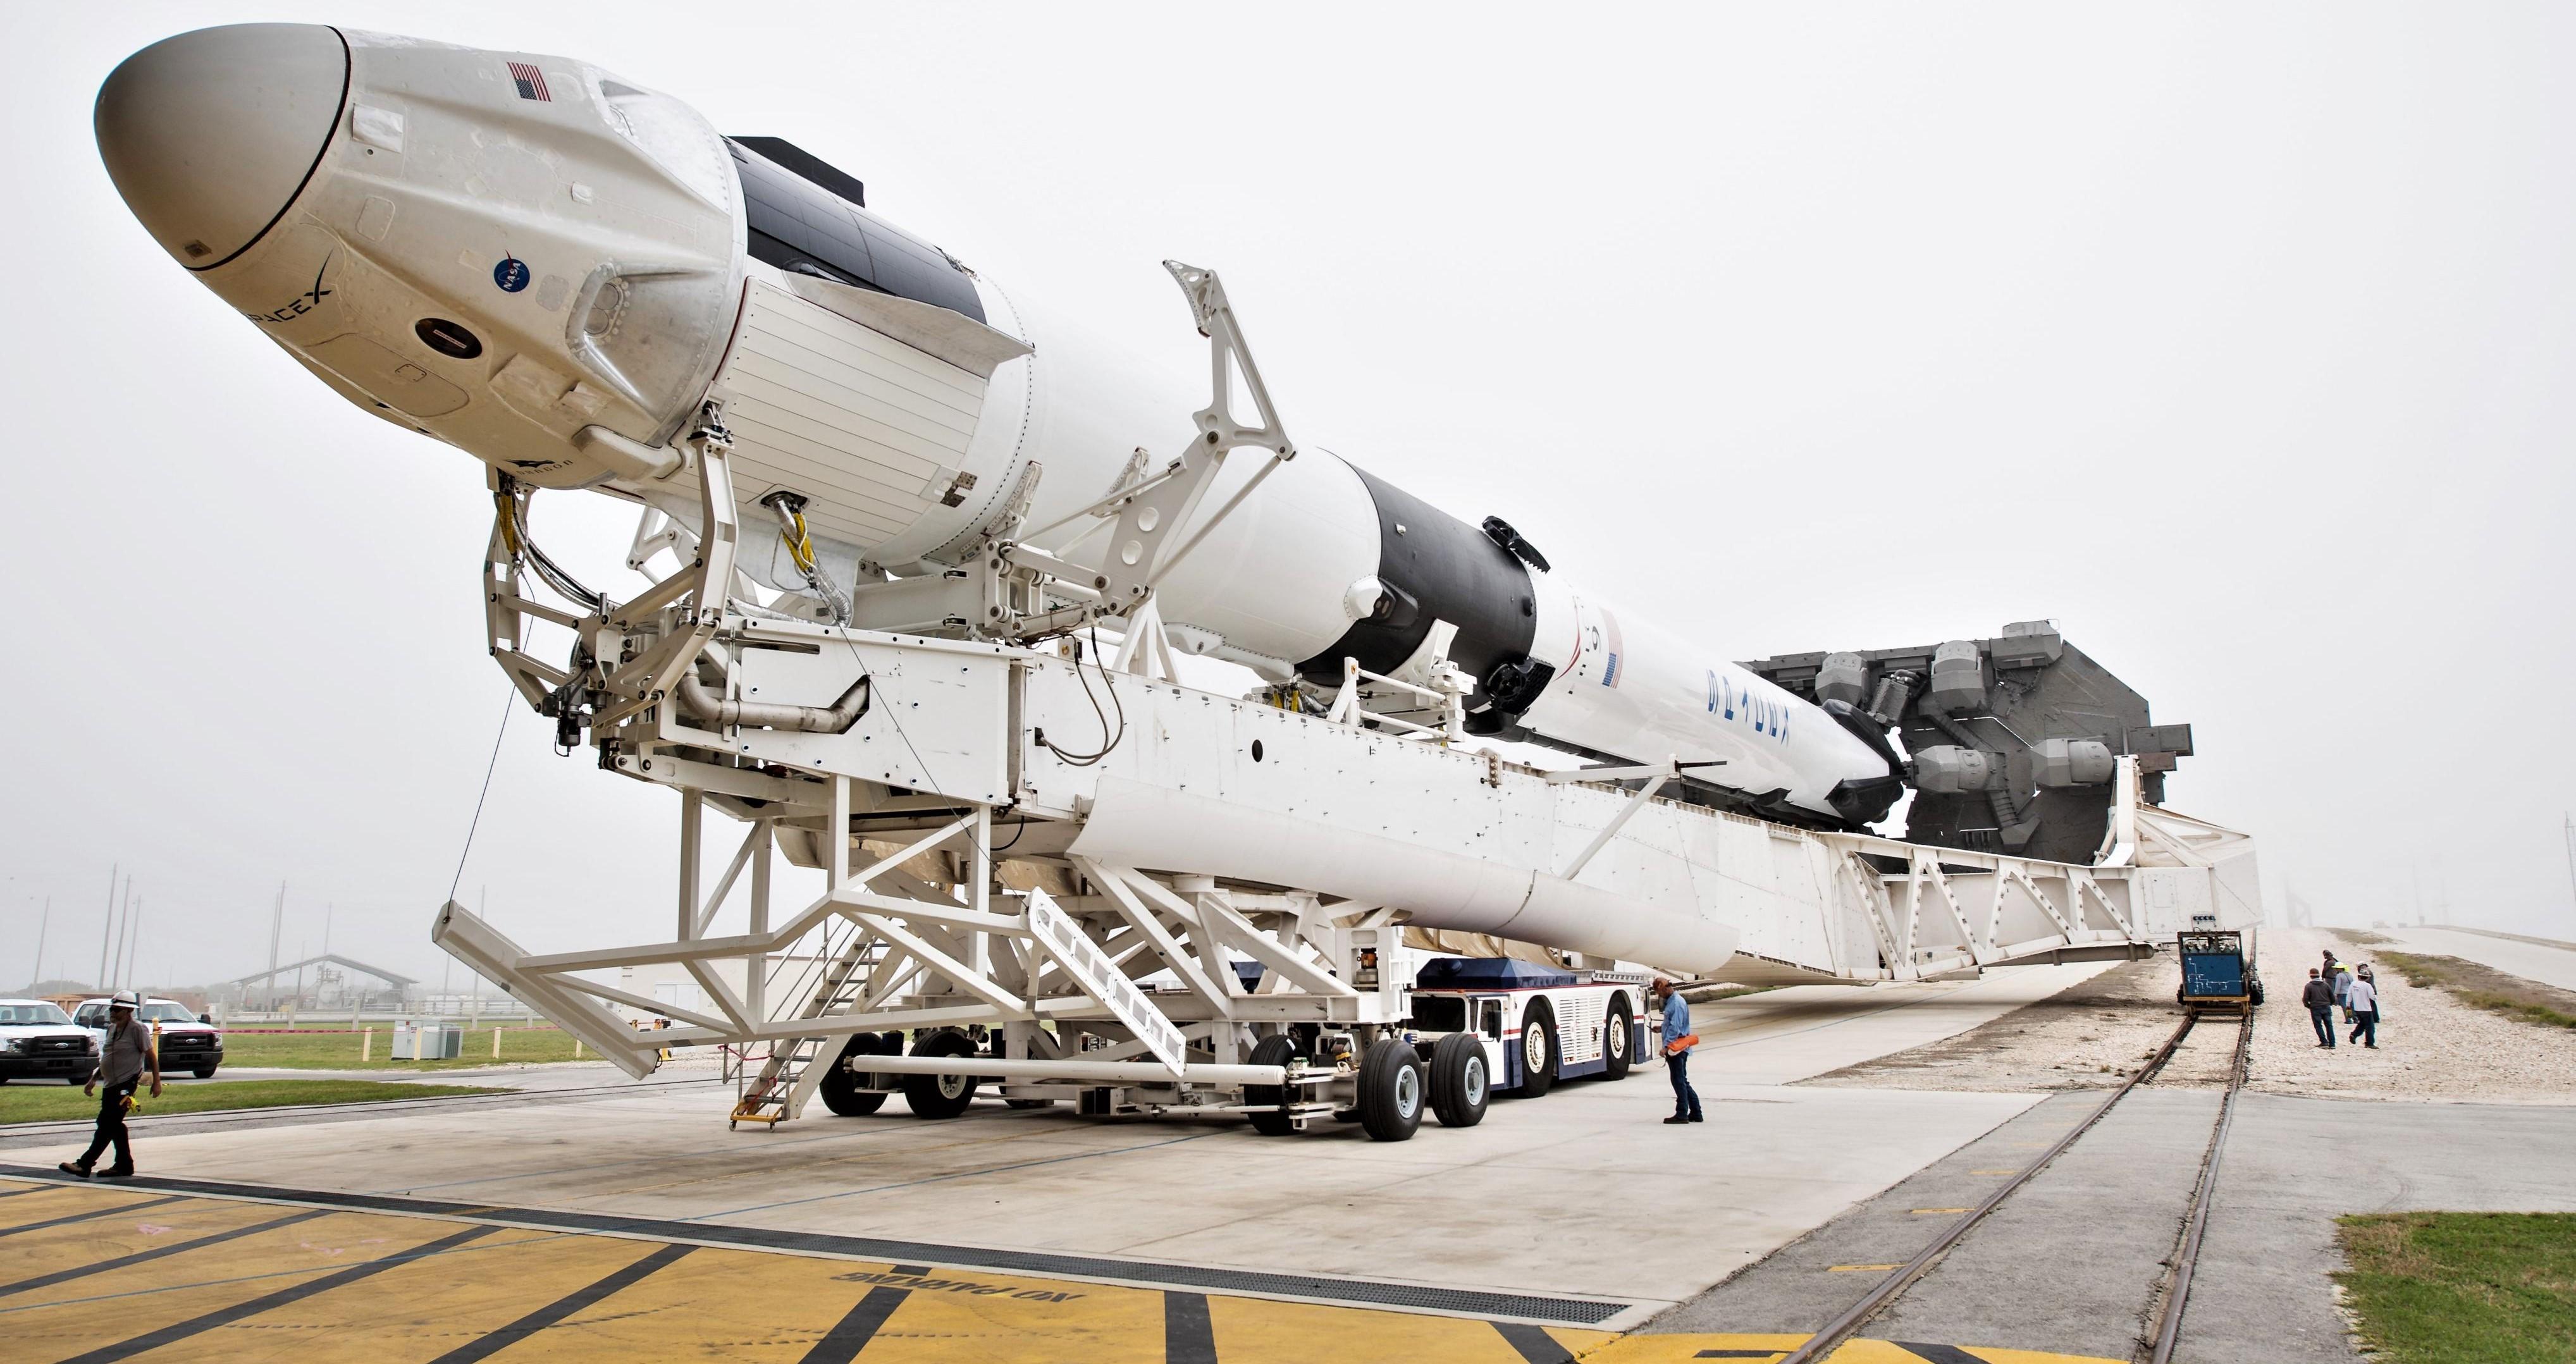 Crew Dragon Falcon 9 DM-1 39A rollout 022819 (NASA – Joel Kowsky) 4 (c) crop